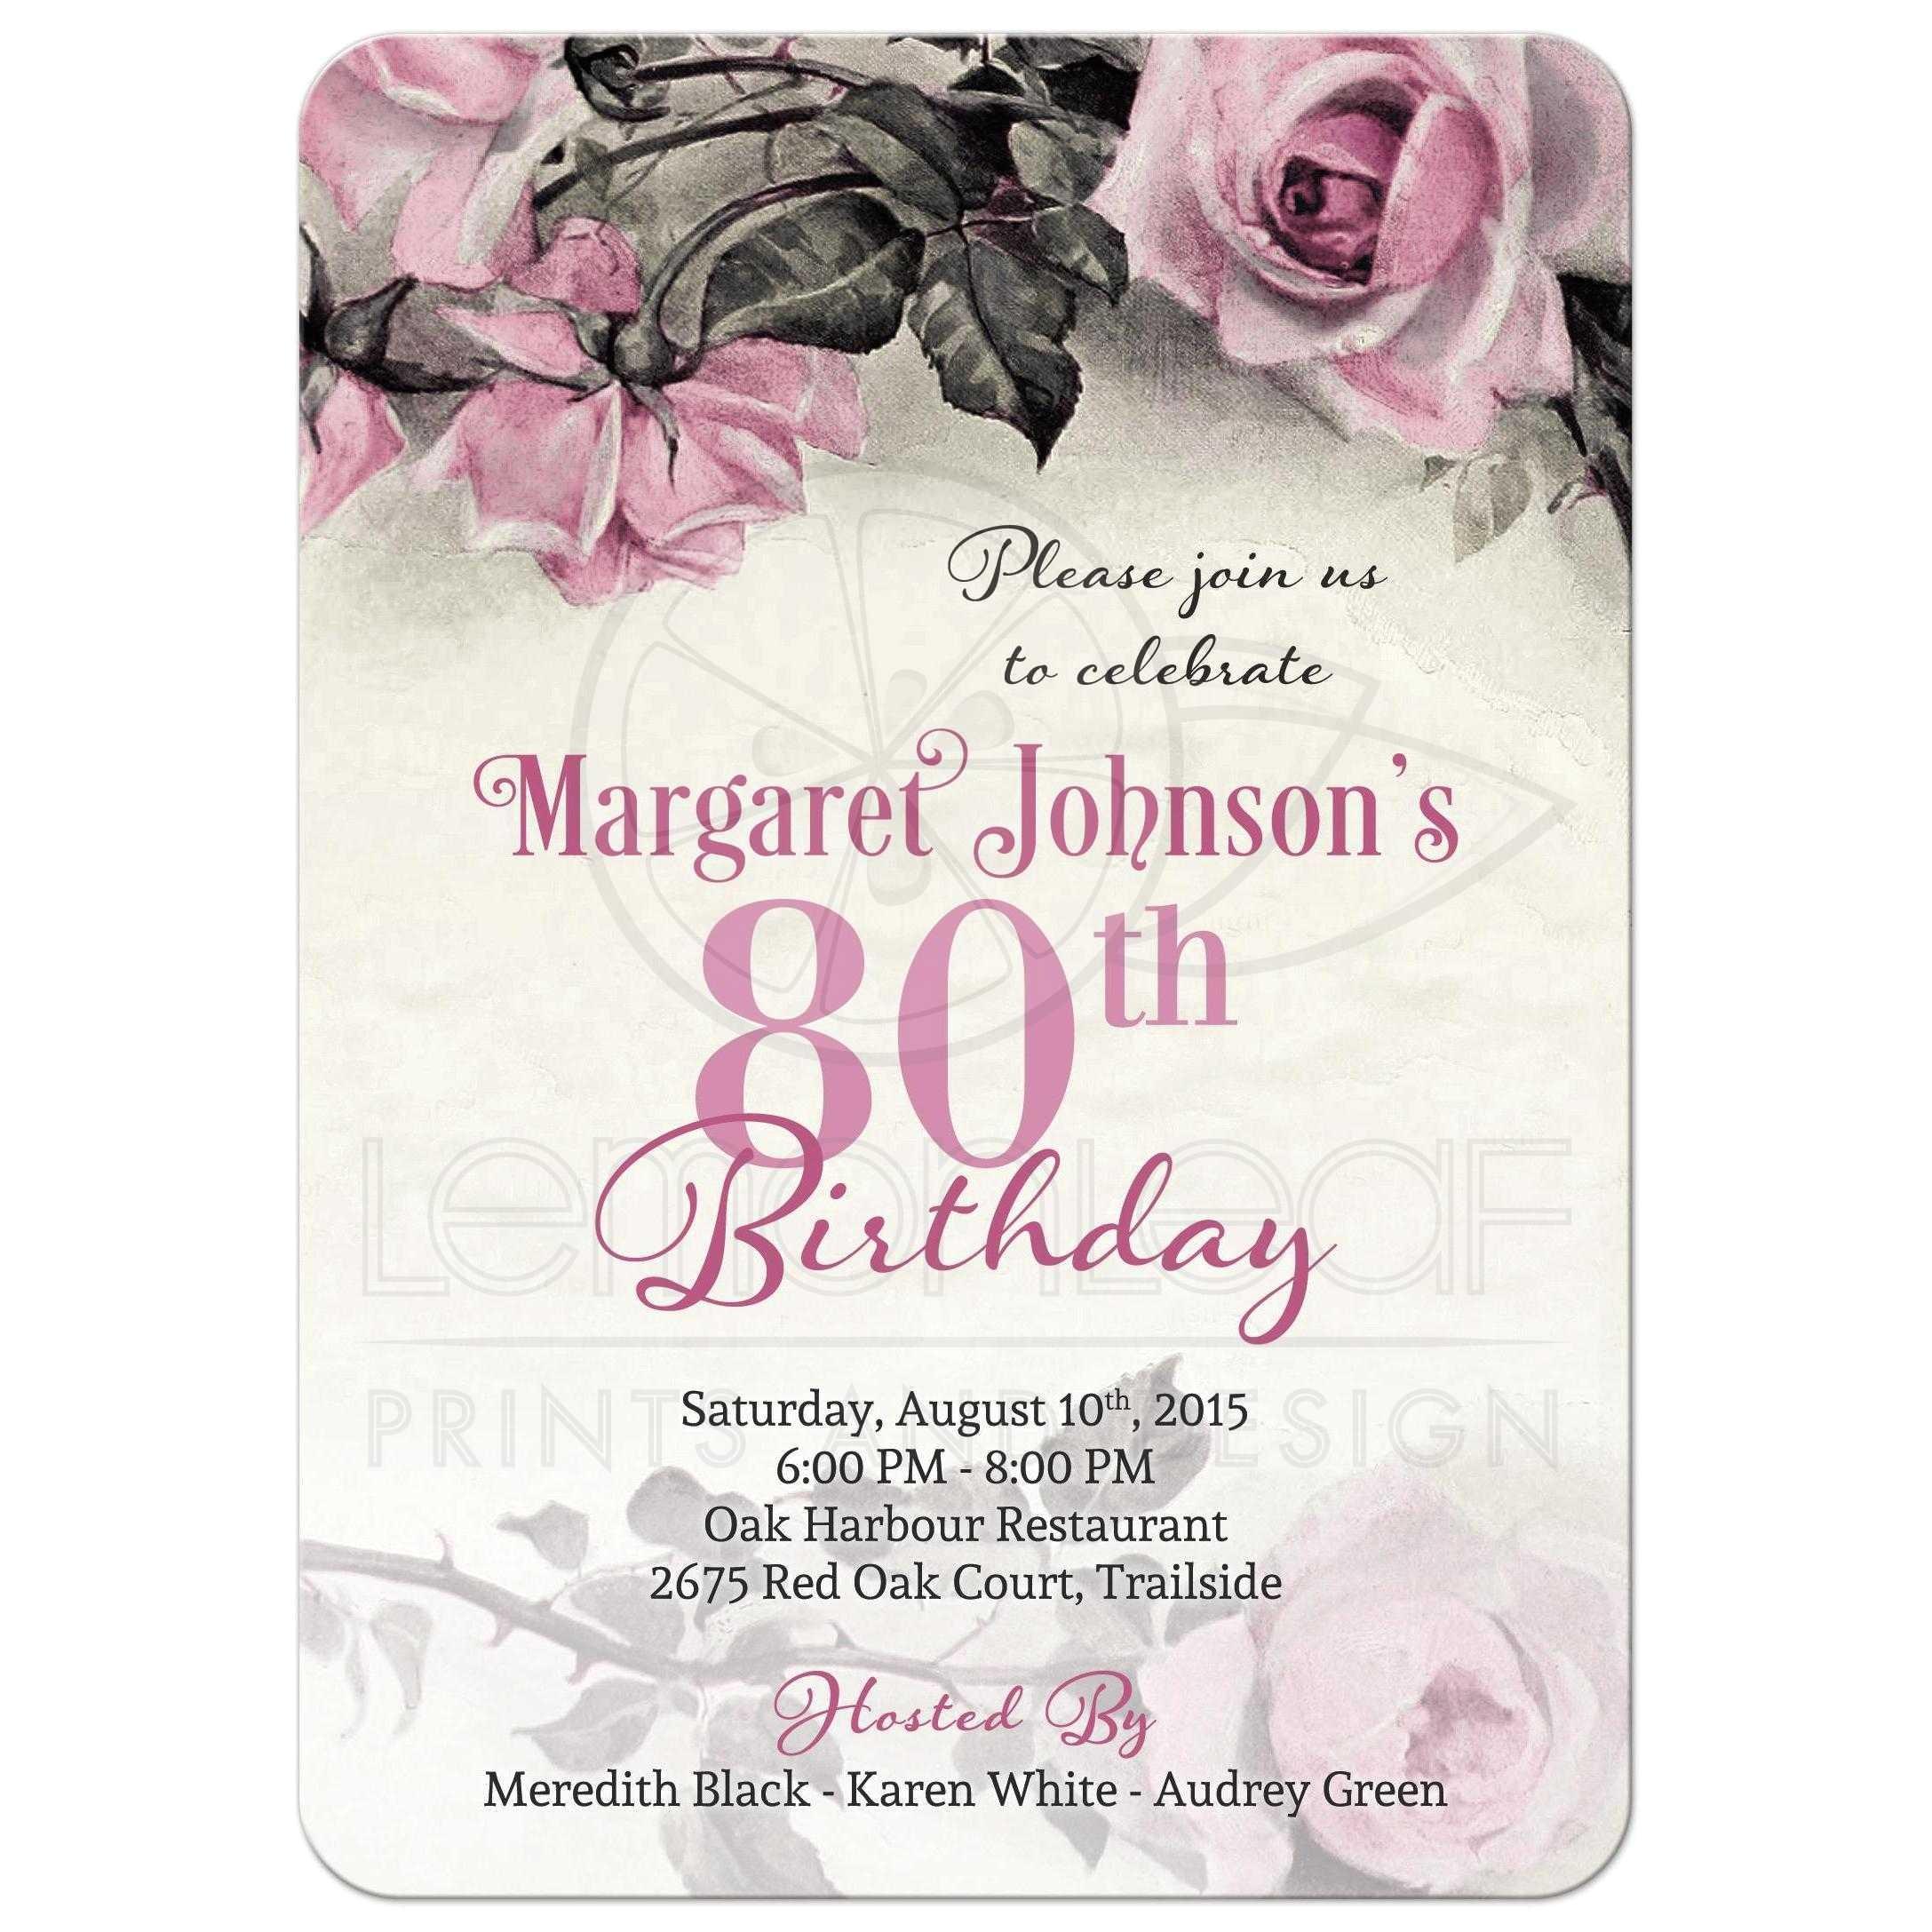 80th Birthday Party Photo Invitations 80th Birthday Party Invitations Party Invitations Templates